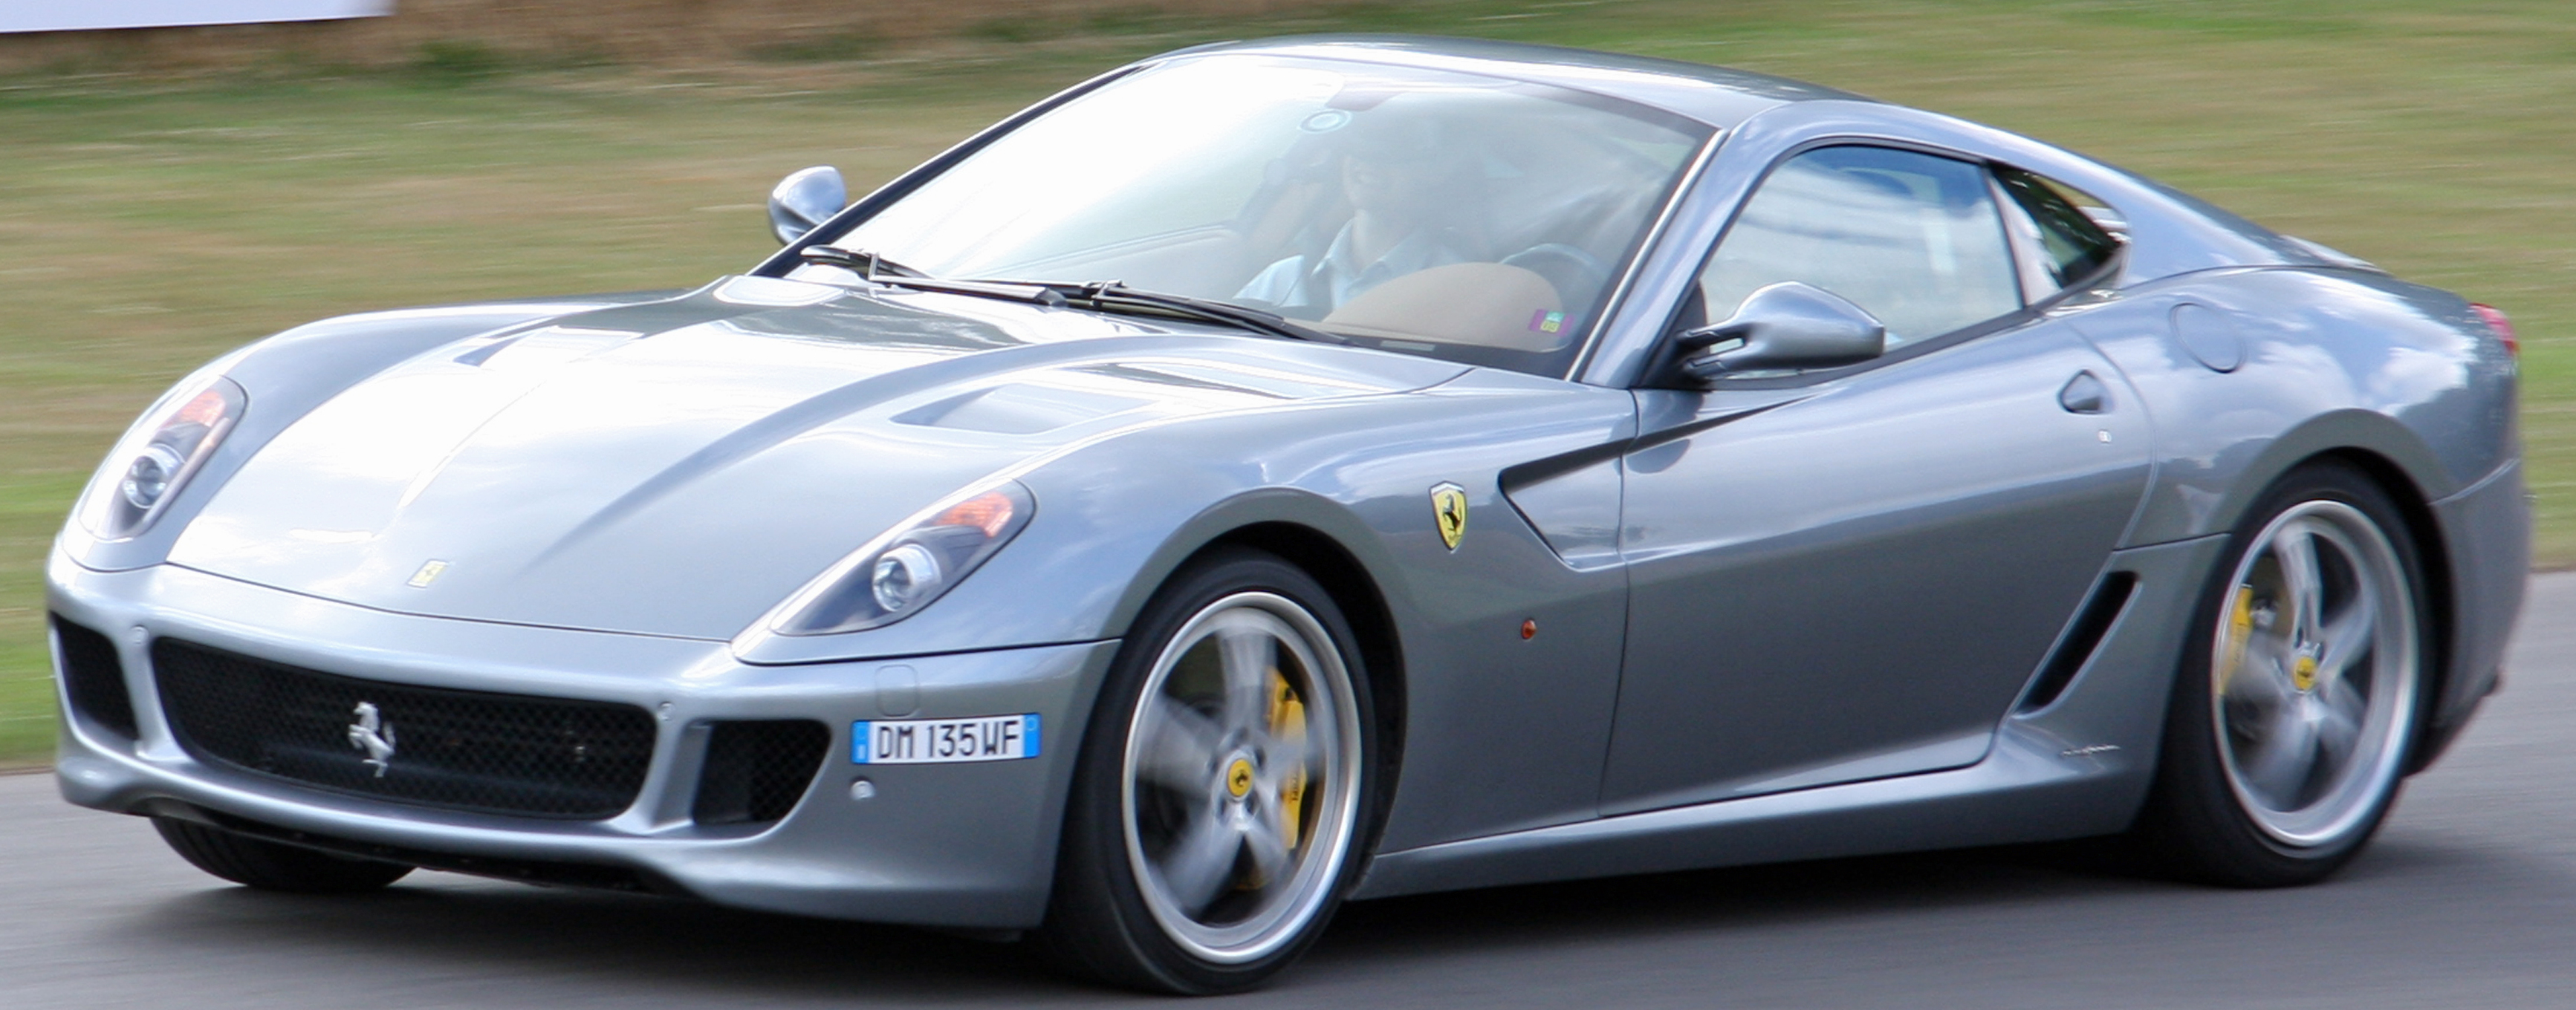 Fichier:Ferrari 599 HGTE.jpg — Wikipédia